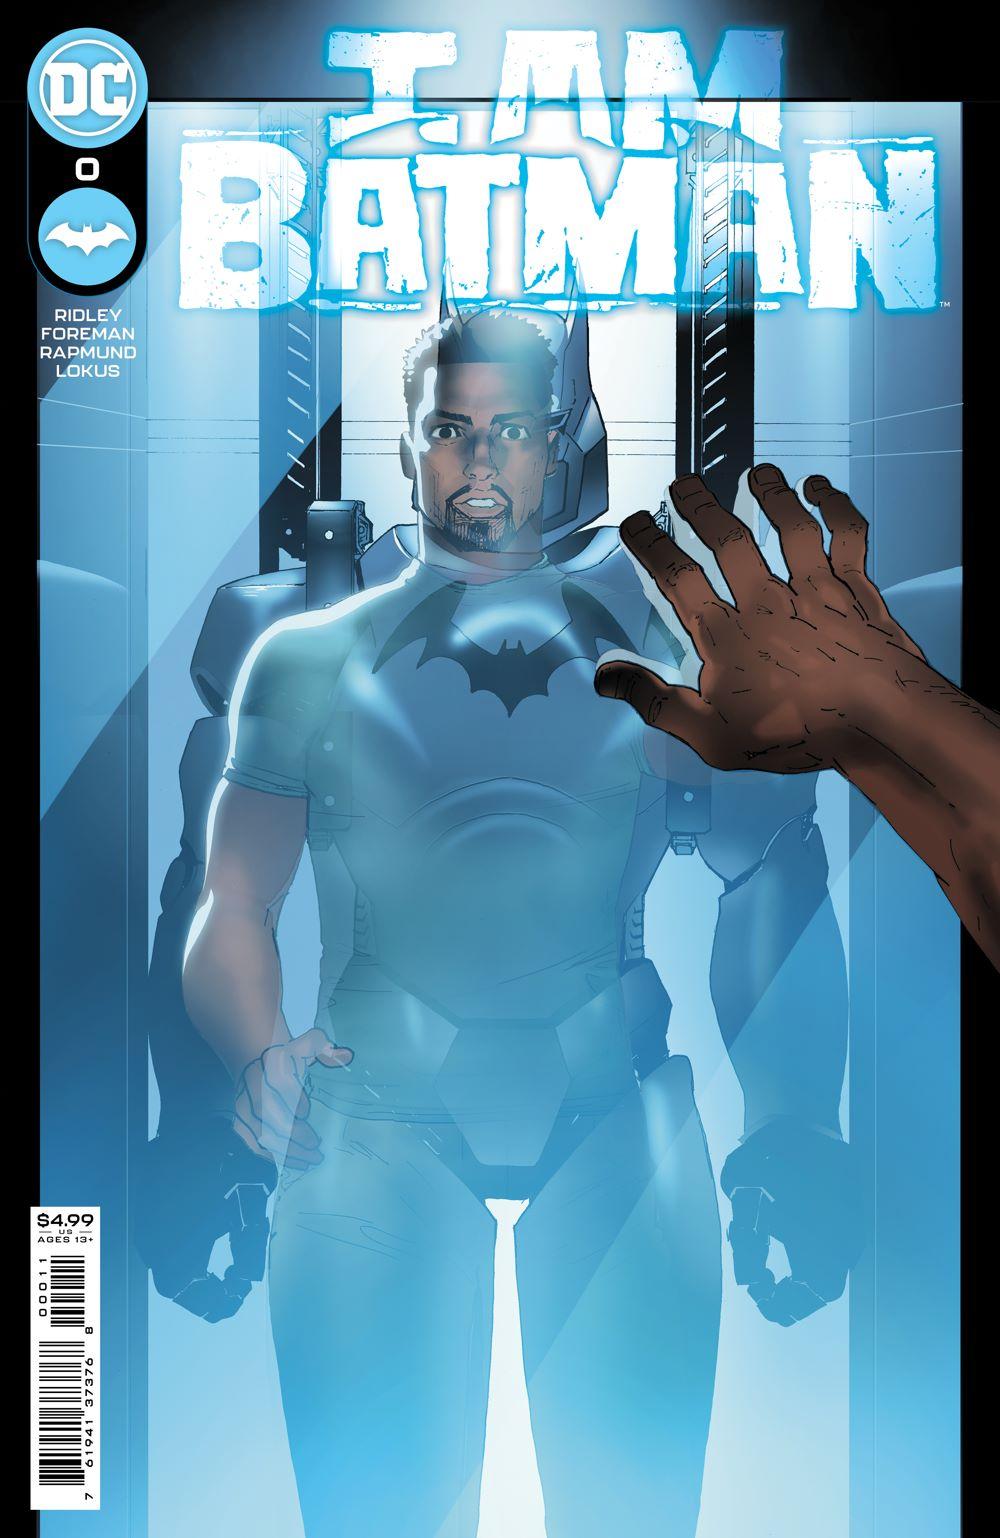 IAMBM_Cv0 DC Comics August 2021 Solicitations